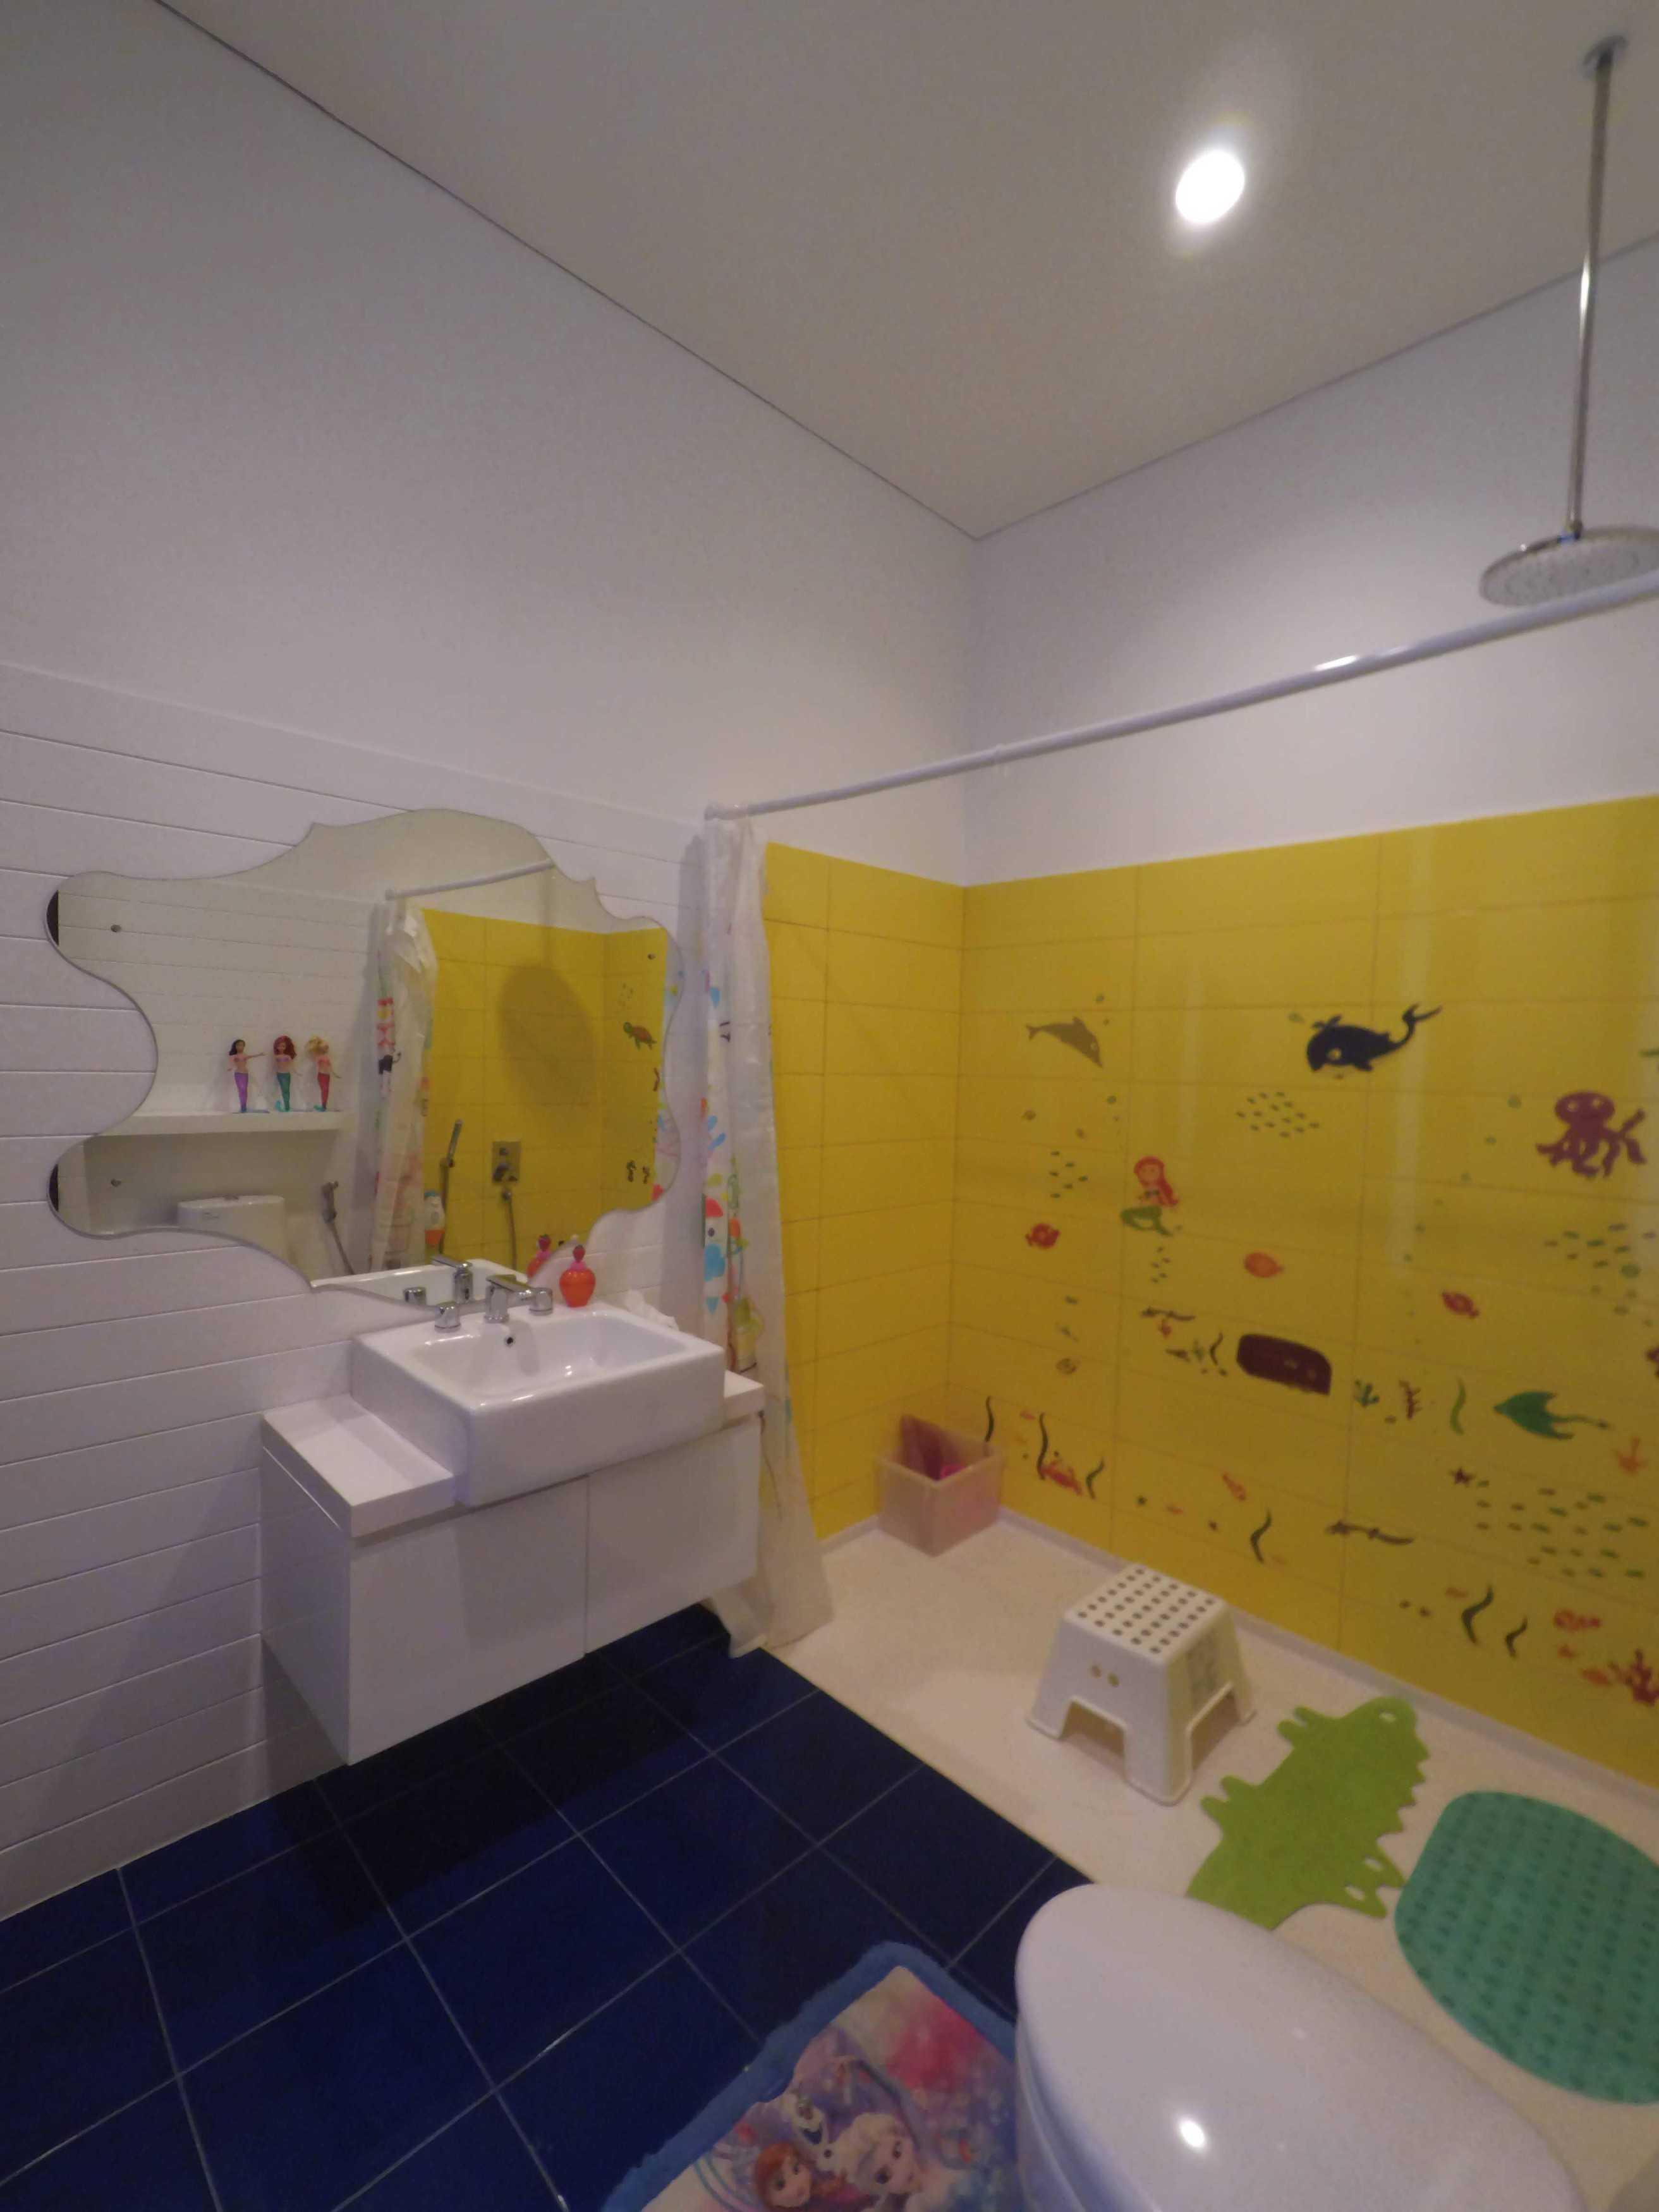 Dezan Studio Interior - Kids Room Pondok Indah Pondok Indah Kids Bathroom   19415